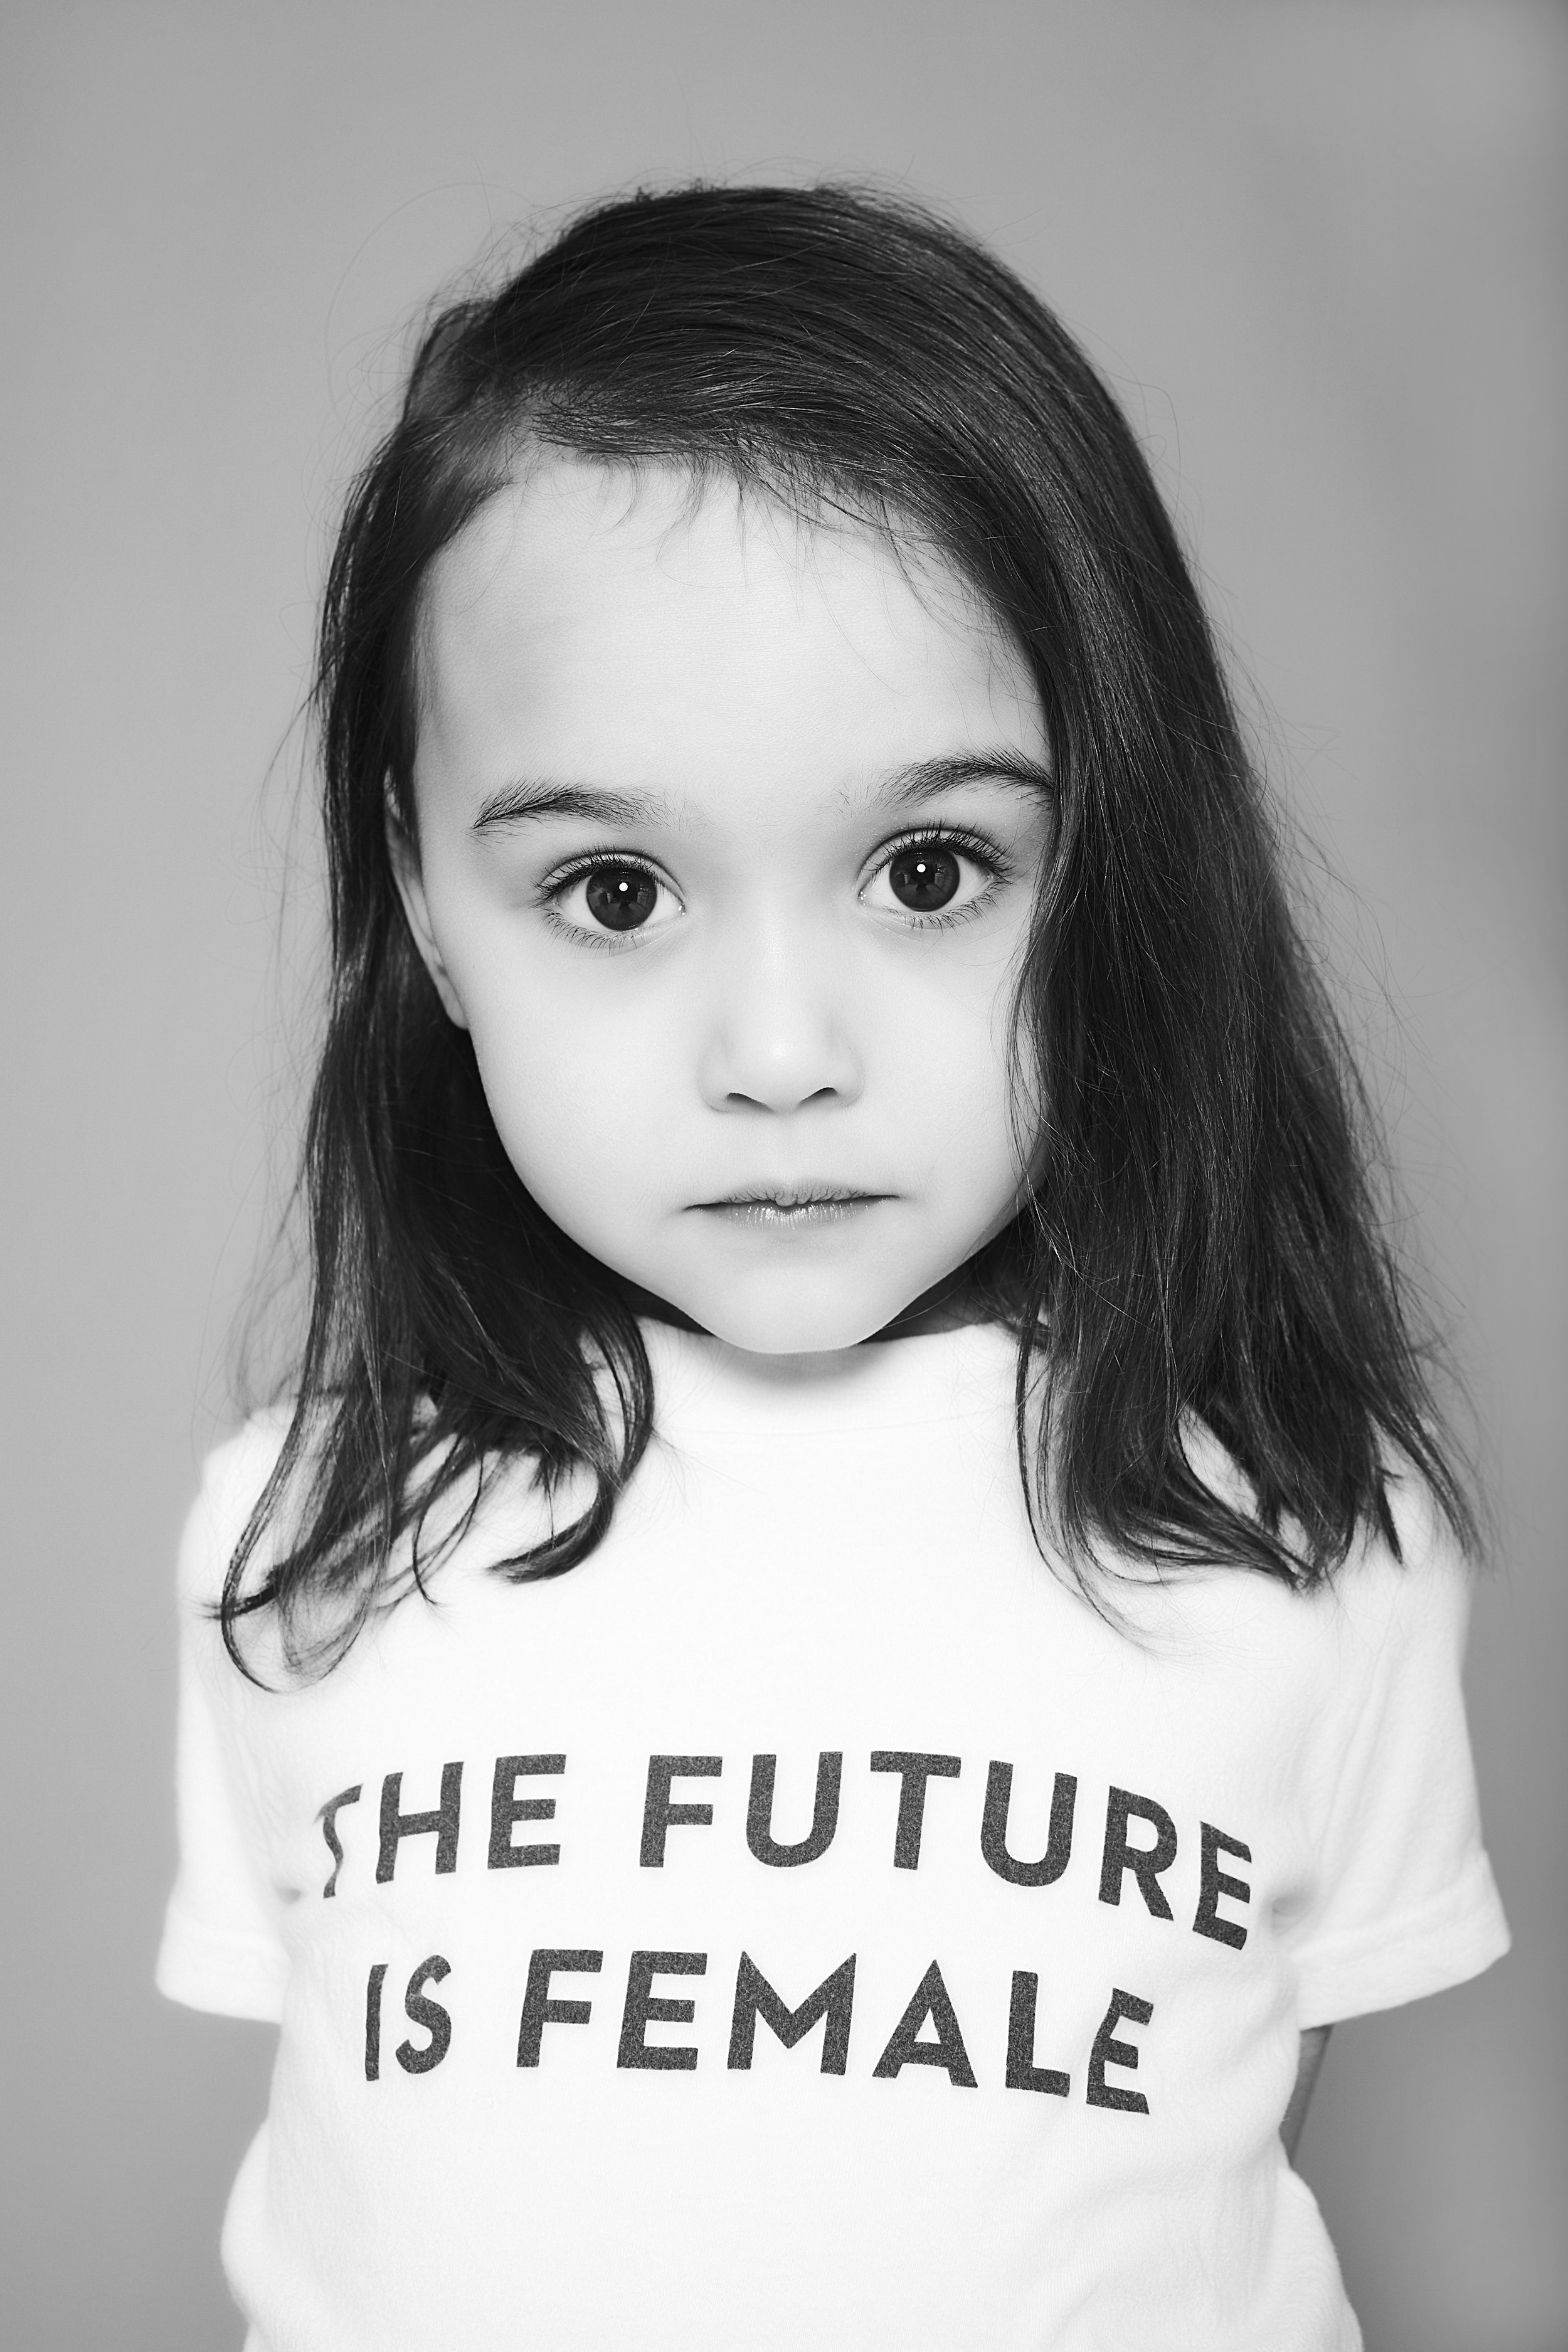 2017_the_future_is_female_017_bw_r.jpg